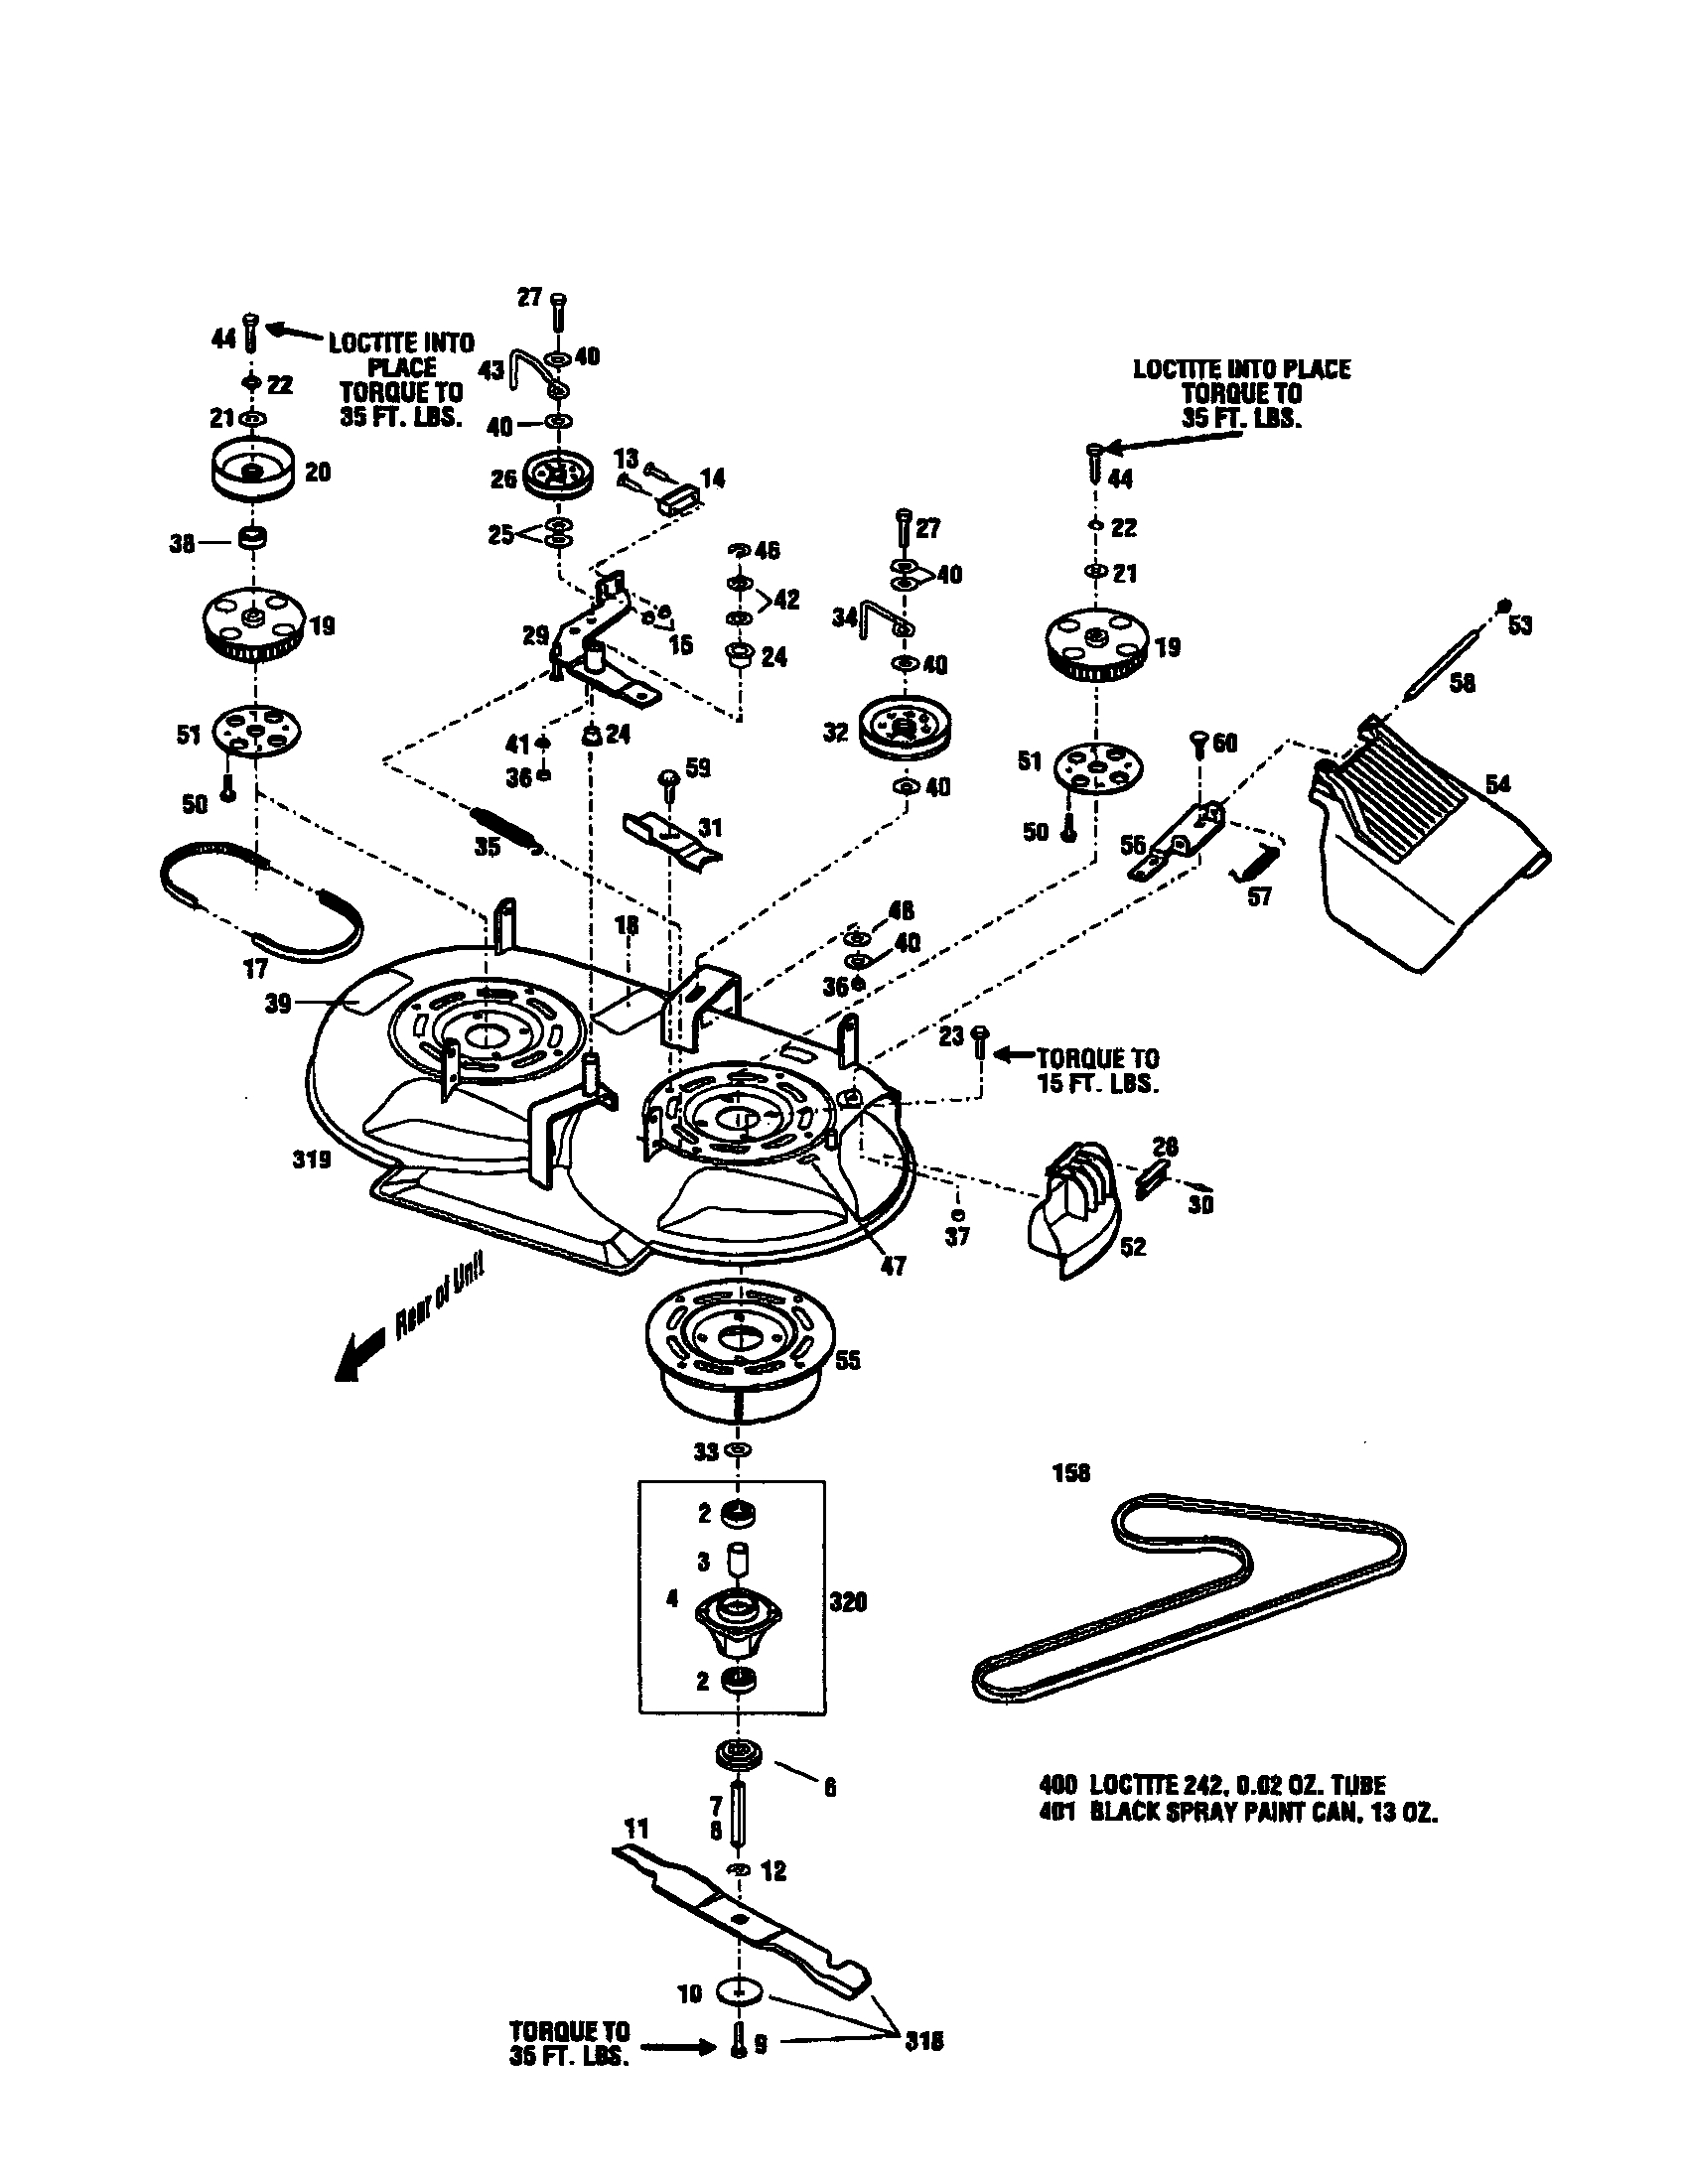 Craftsman Model 987889010 Walk Behind Lawnmower, Gas Genuine Parts - Wiring Diagram For Craftsman Riding Lawn Mower